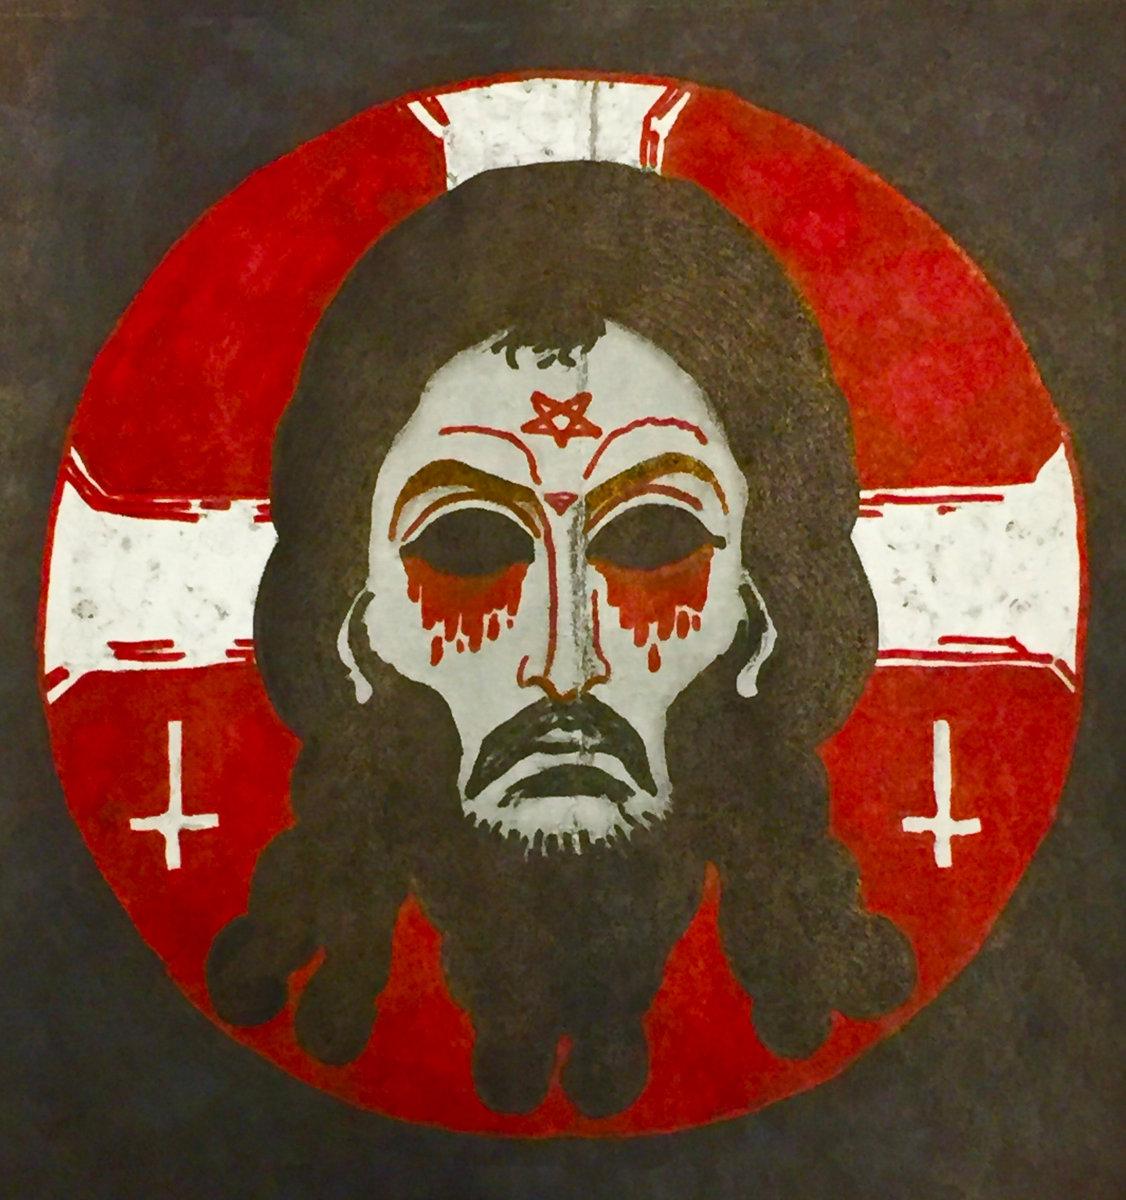 Cult of the Nazarene